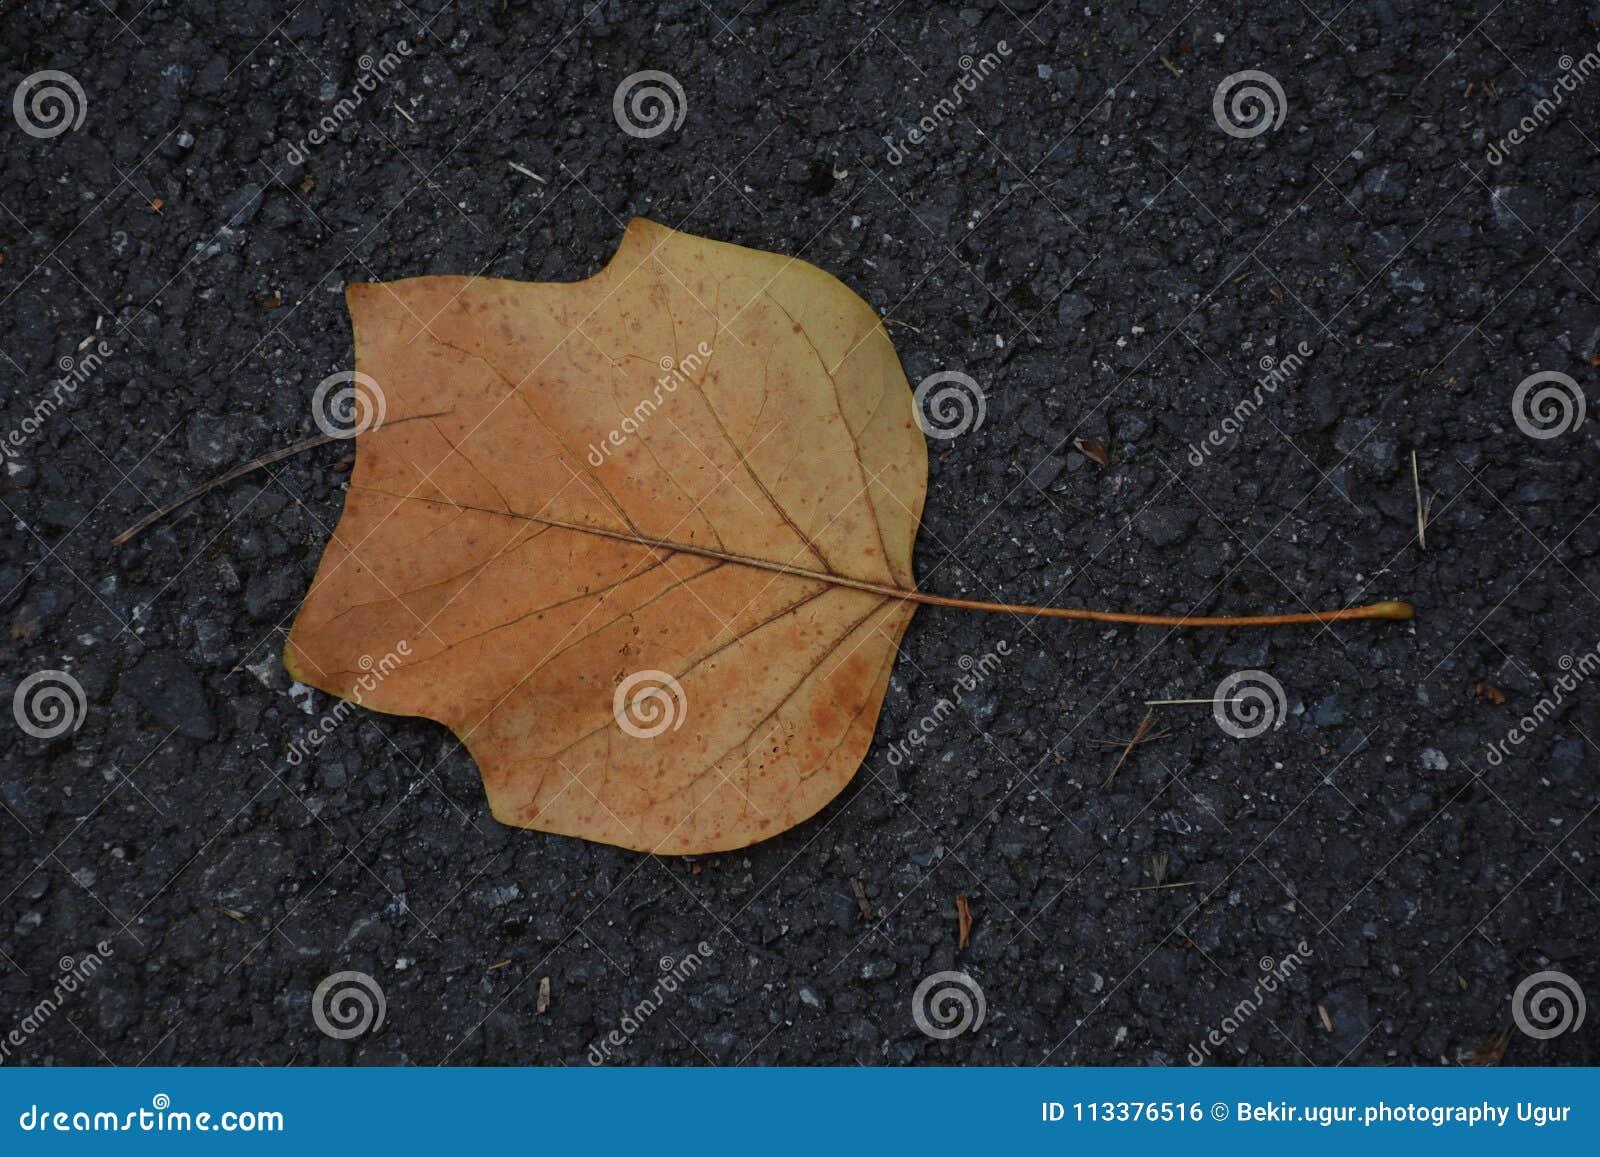 Leaf on the ground stock photo. Image of autumn, garden - 113376516